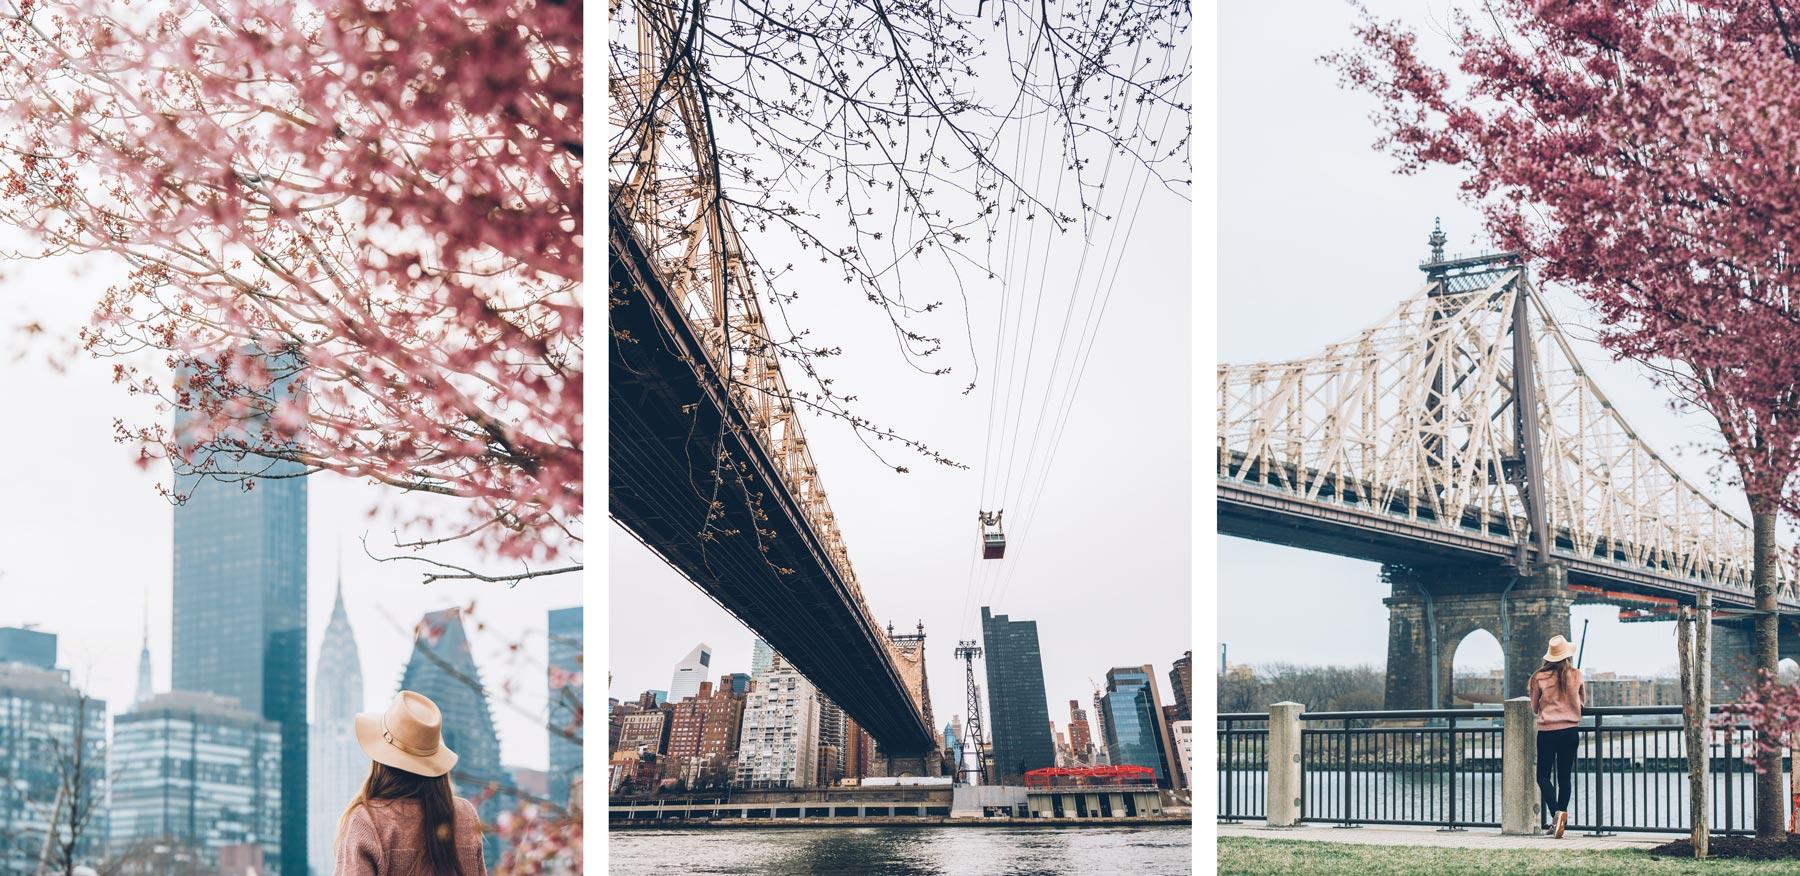 Roosevelt Island, New York, Cerisiers en fleur